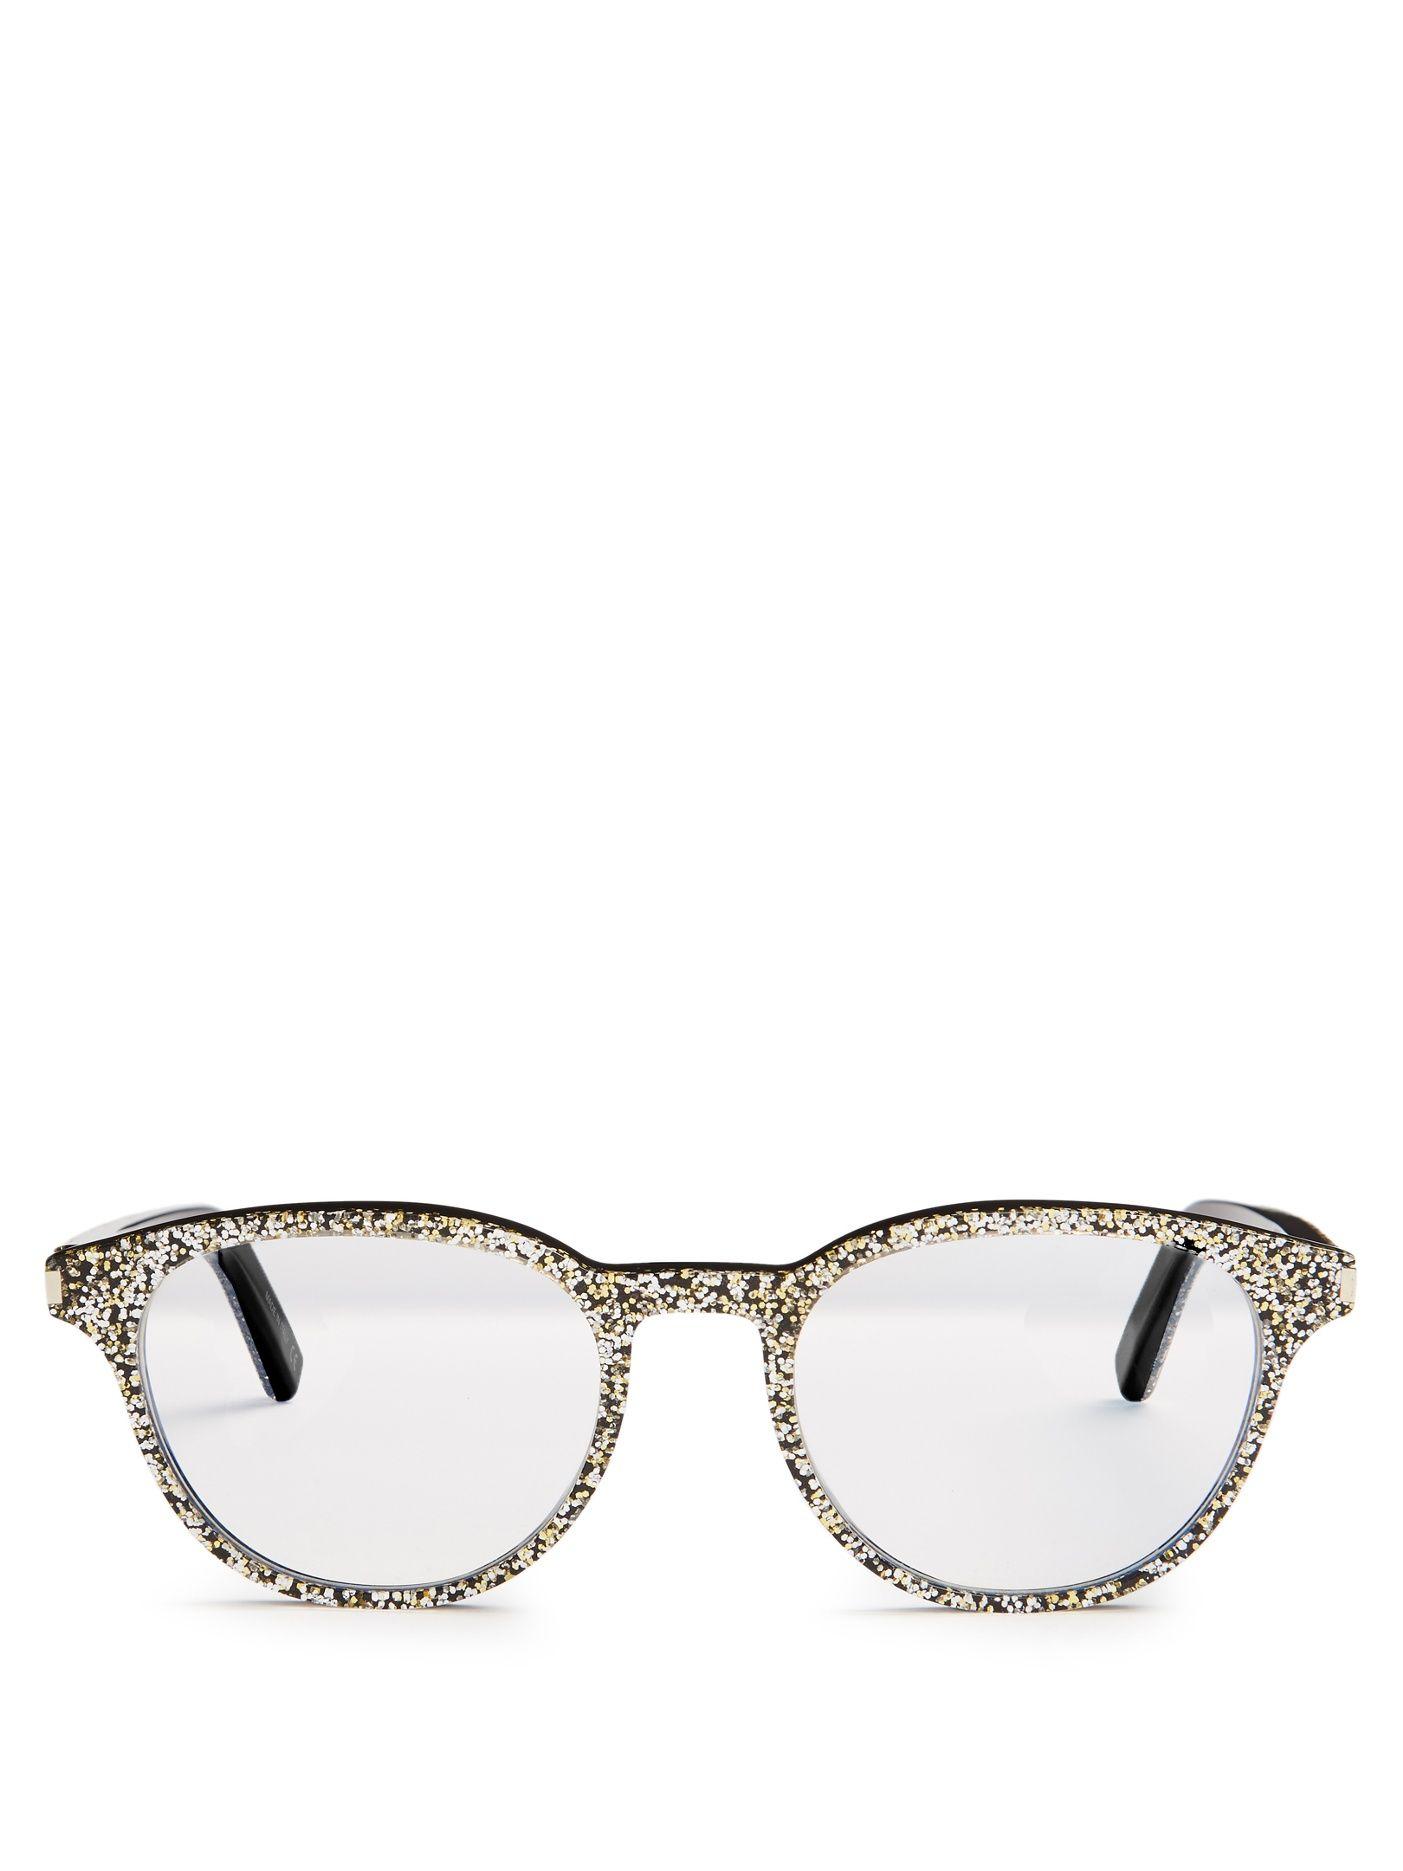 7c748d9ff Saint laurent Round-frame glitter glasses £175 Armações De Óculos, Óculos  De Brilho